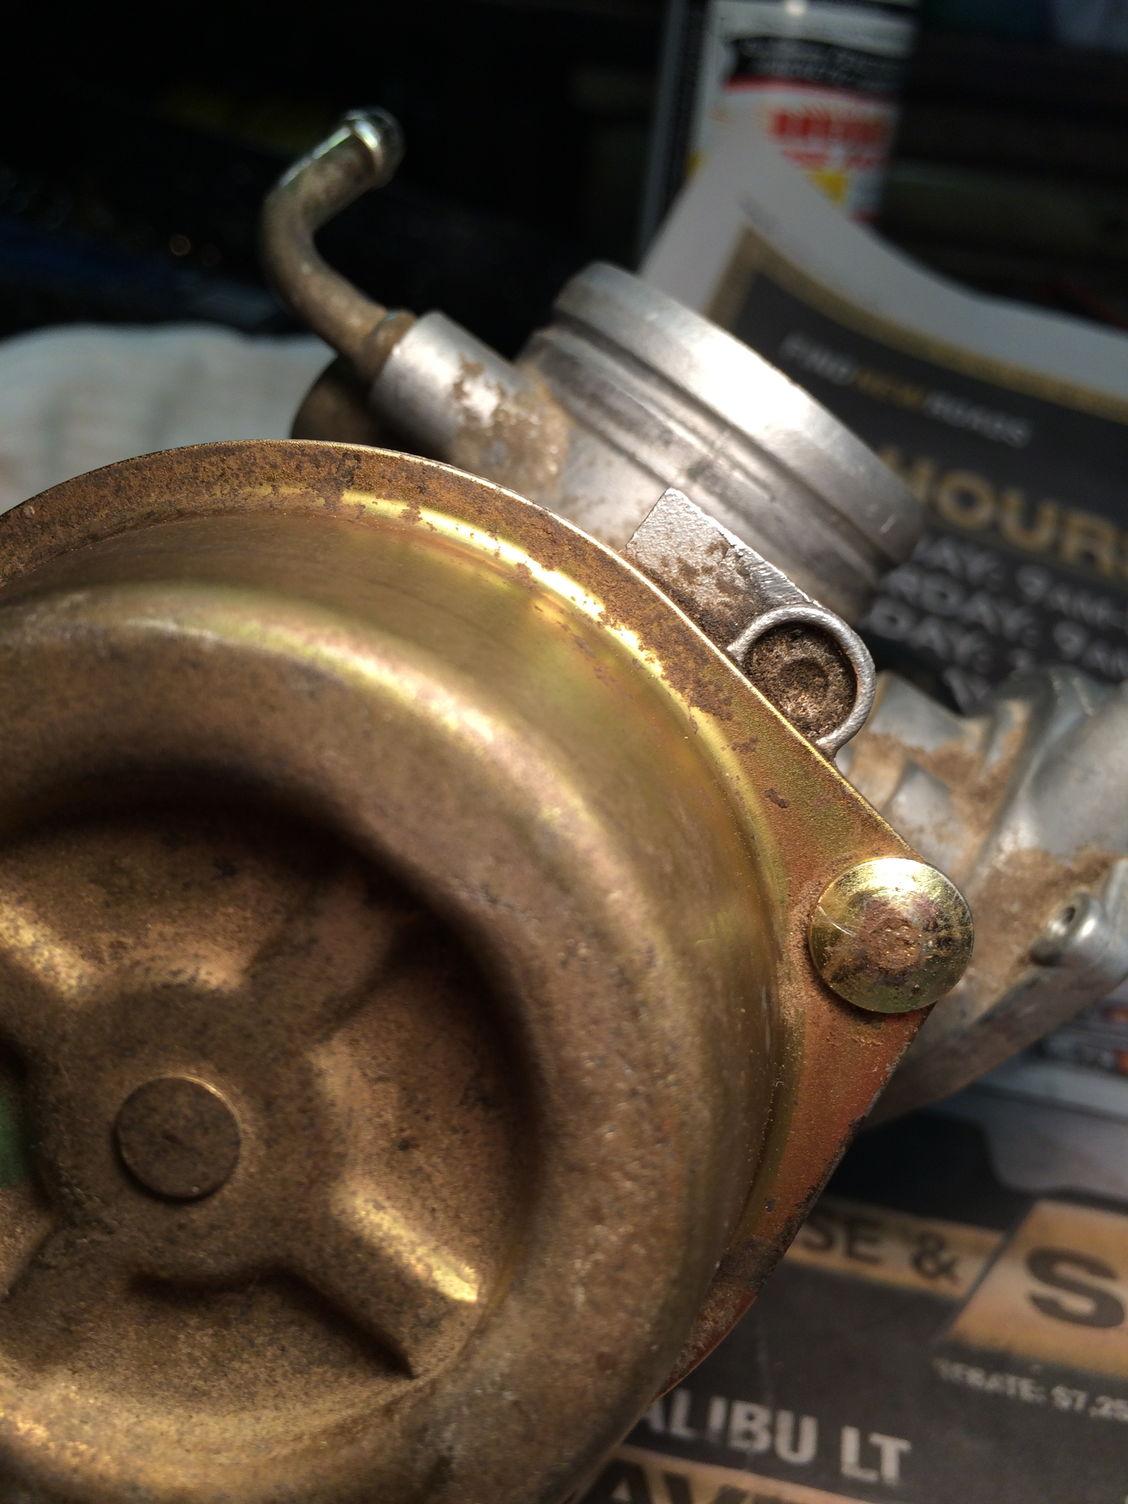 Mikuni Bst 31 Manual Air Compressor Wiring Diagram Makita Mac2400 Hitachi Ec12 Array What Is Small Copper Tube On Carb Atvconnection Com Atv Rh